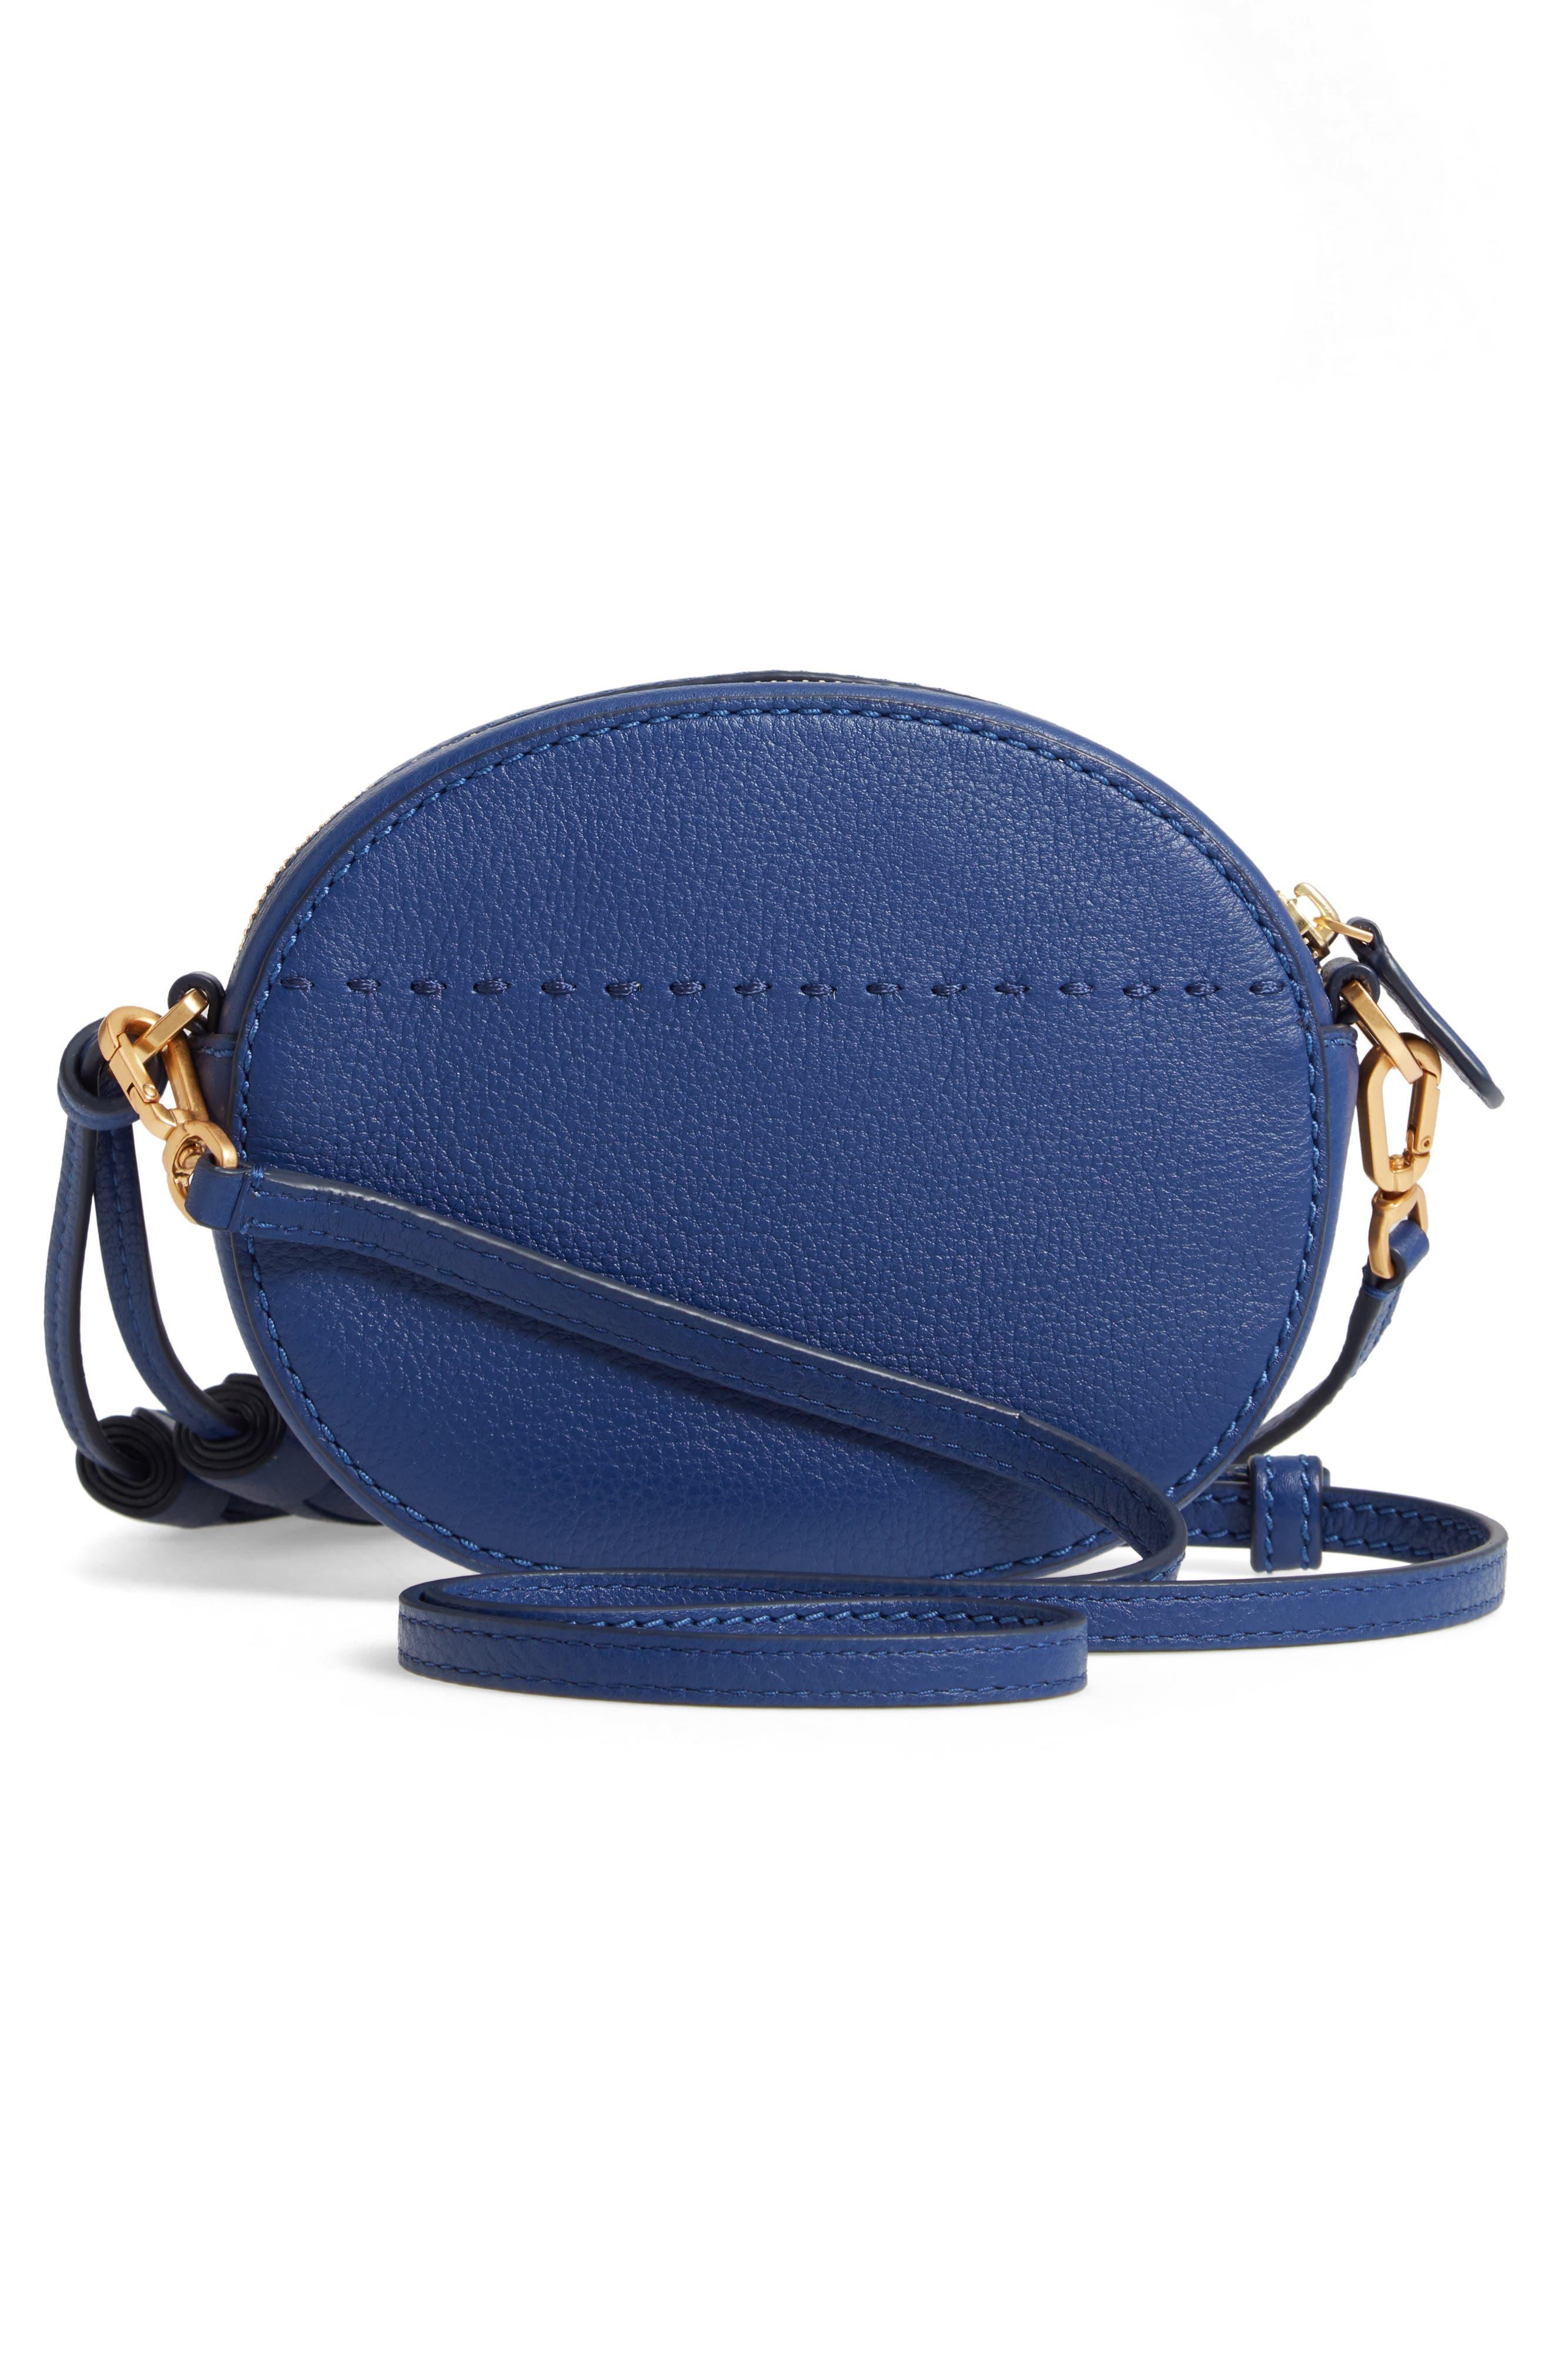 McGraw Leather Crossbody Bag,                             Alternate thumbnail 3, color,                             BRIGHT INDIGO